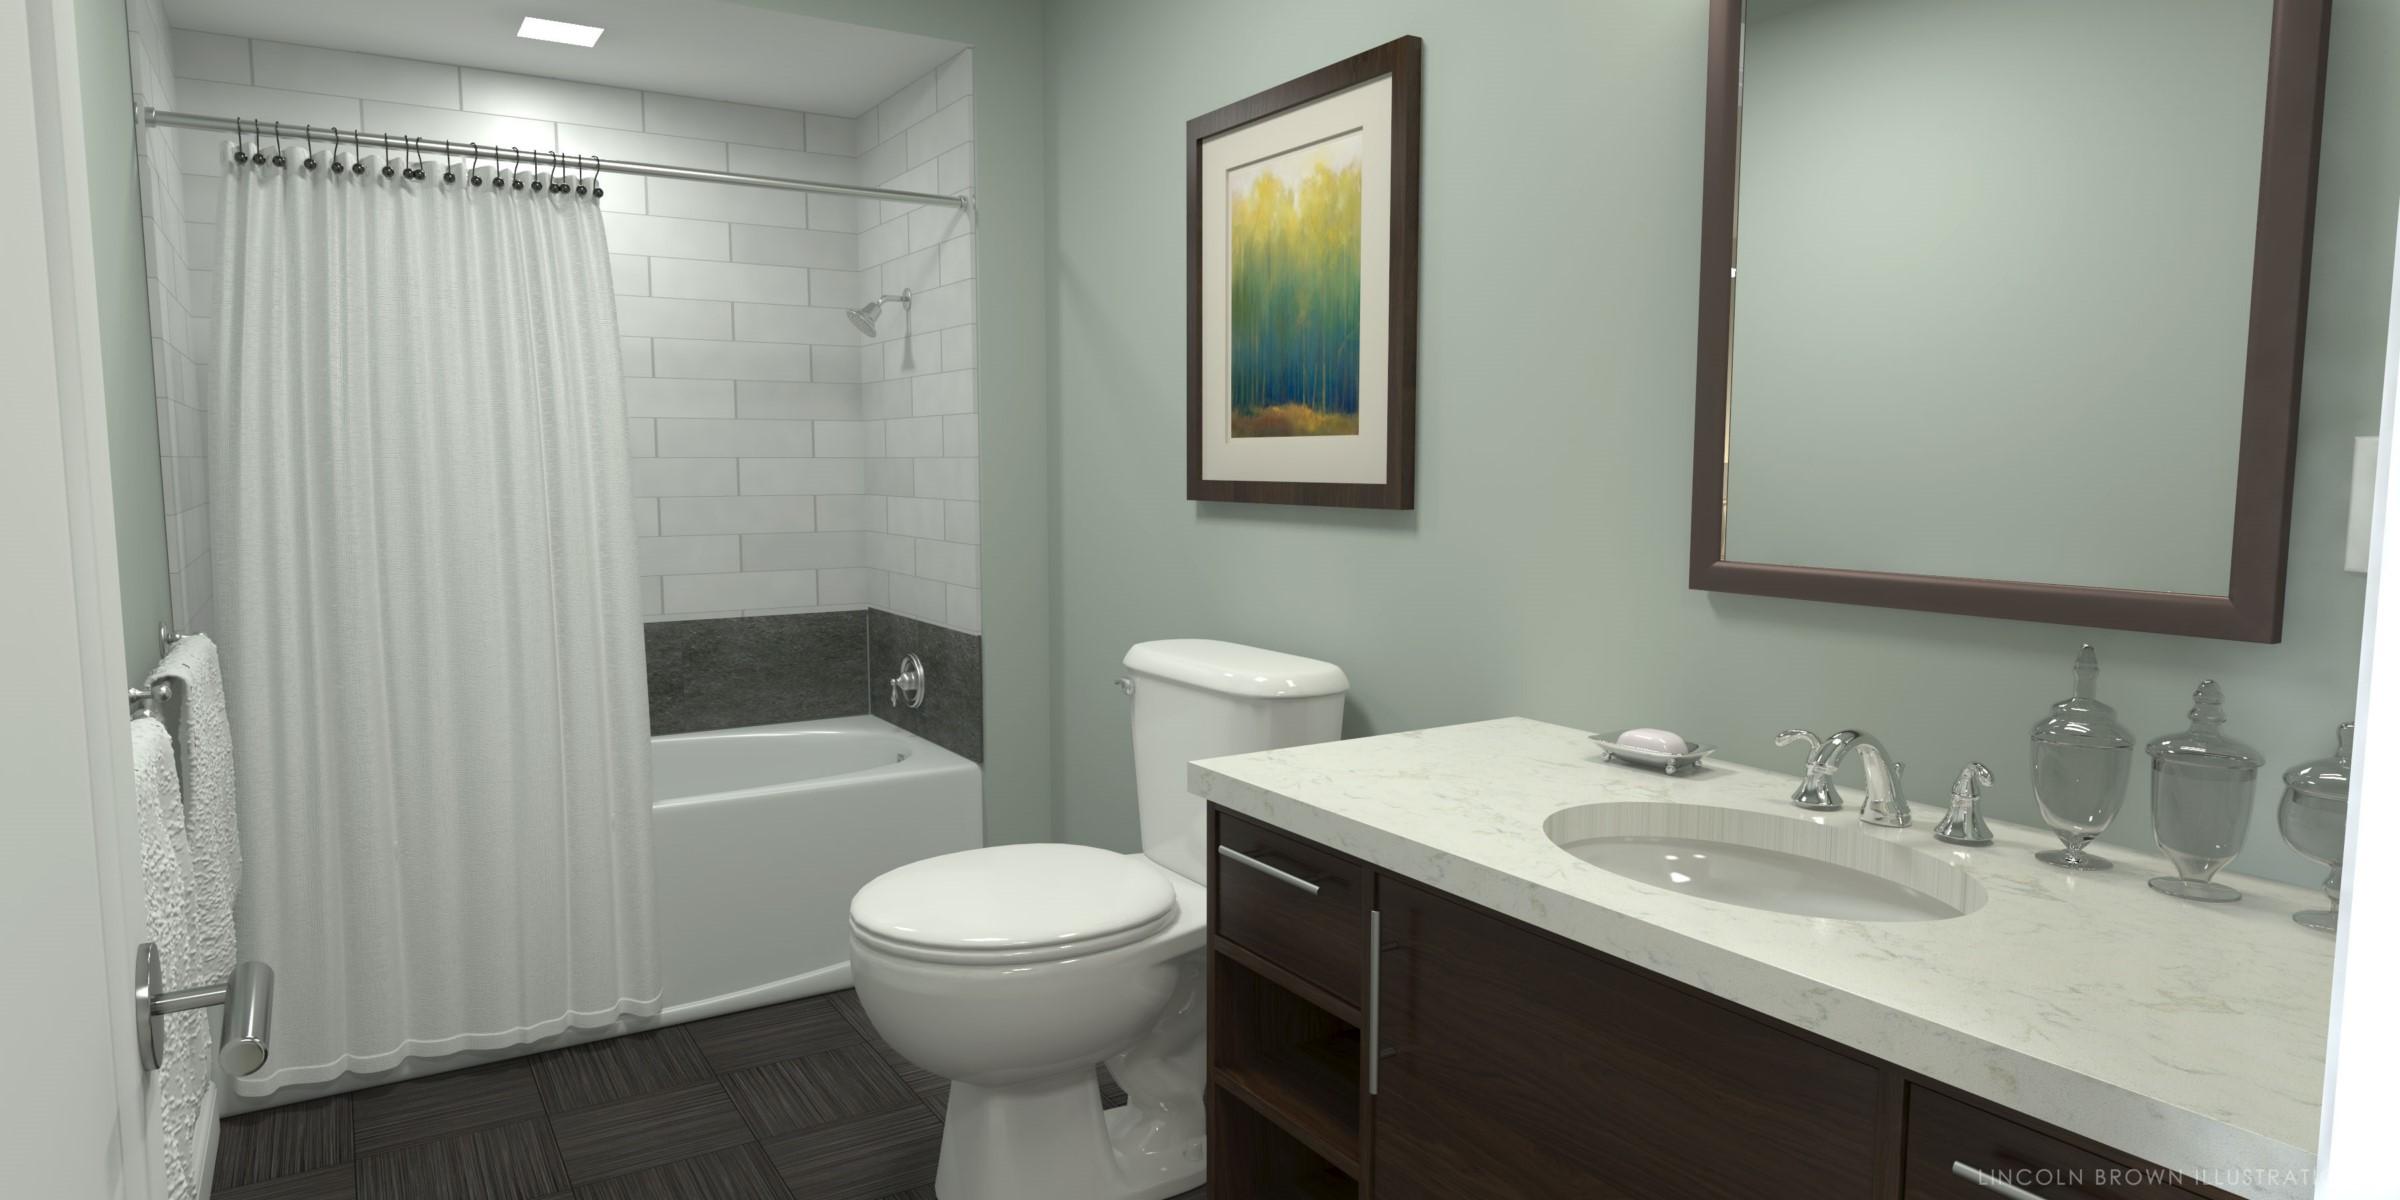 2013-09 Pavilion Grand - Bathroom.jpg